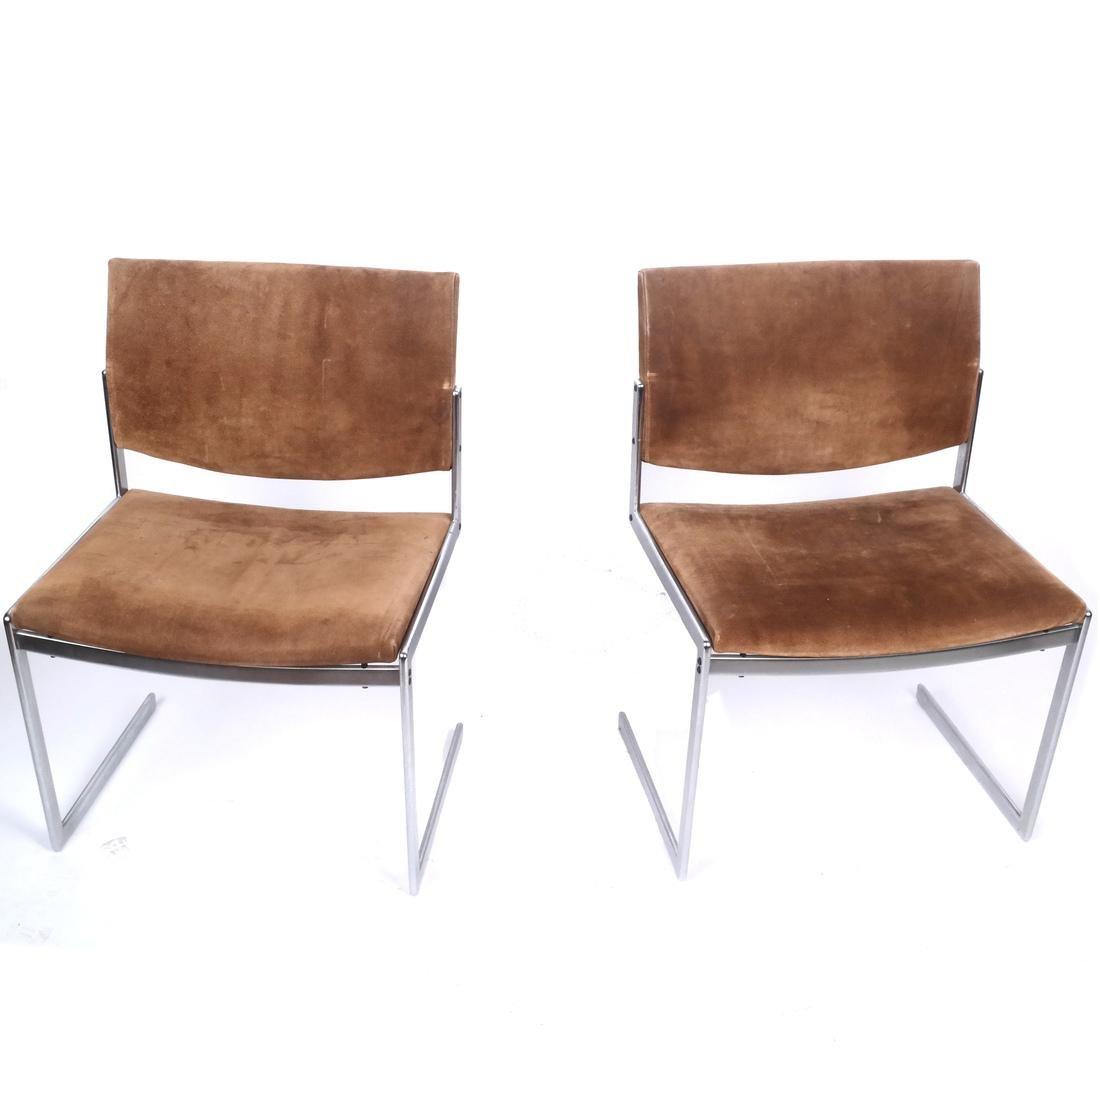 Six K-11 International Knoll-Manner Chairs - 2